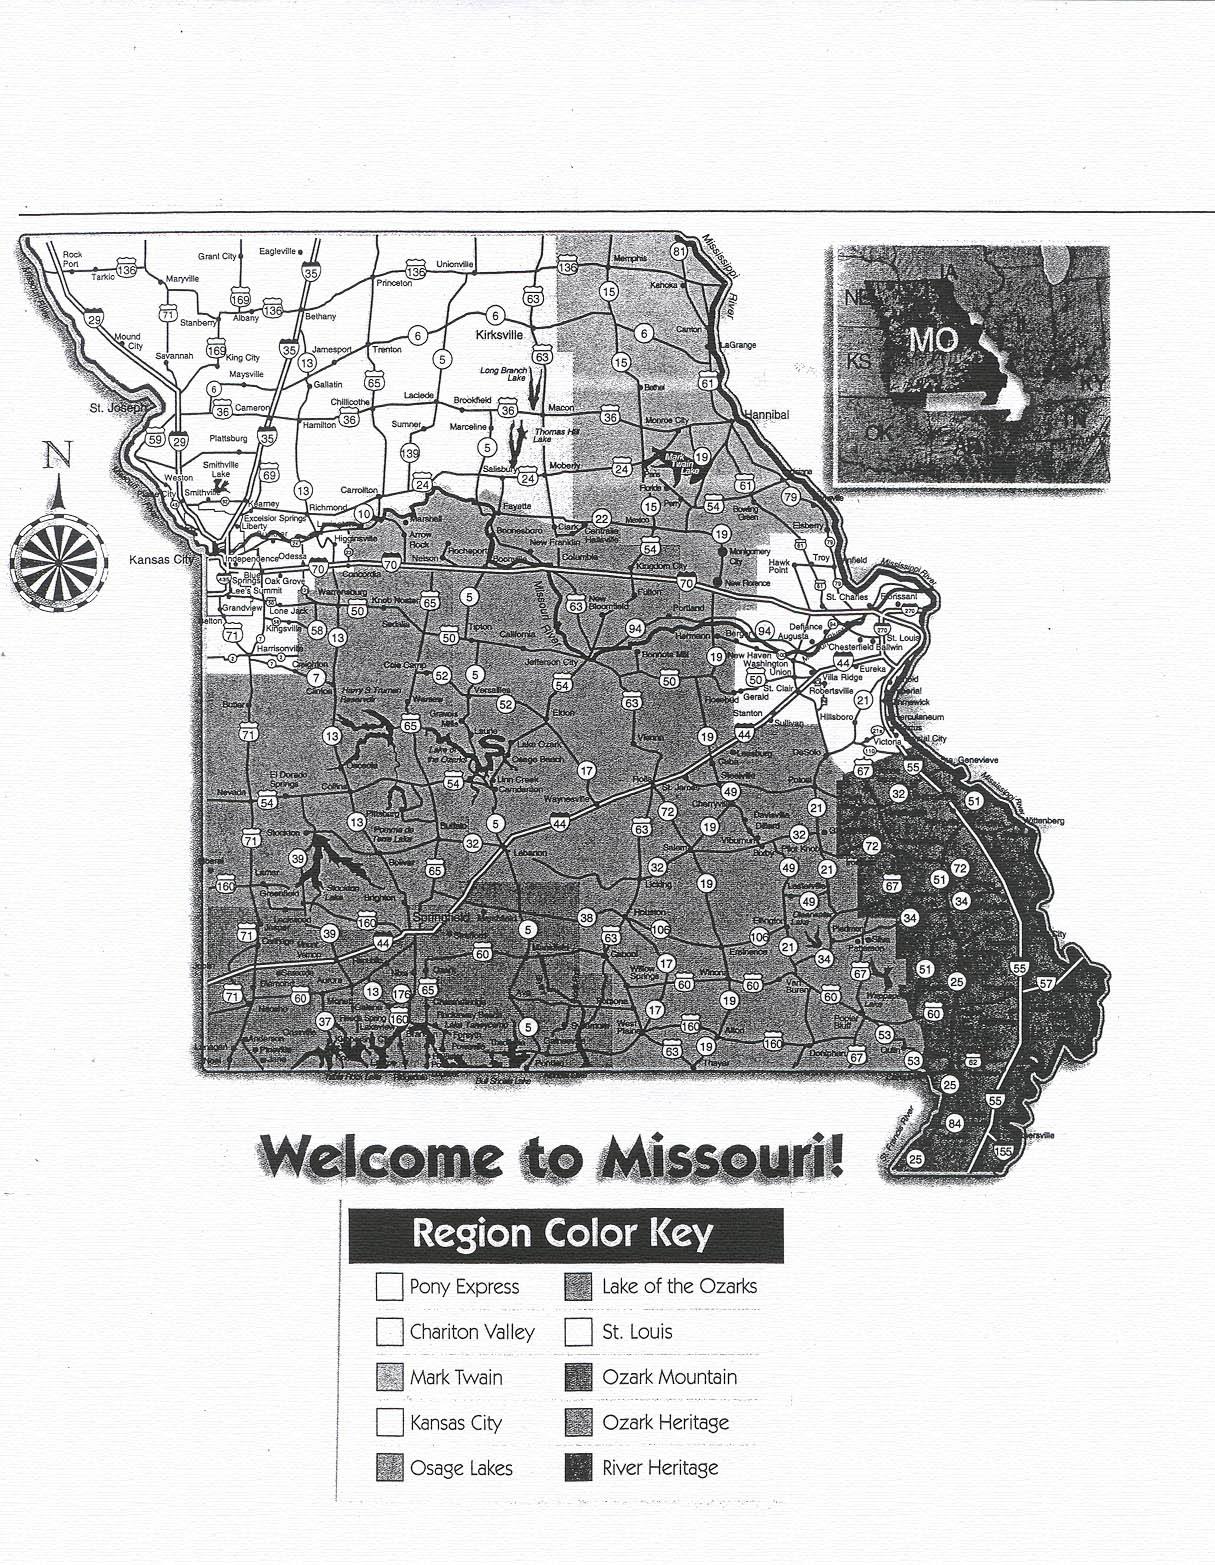 Missouri Vacation Learning Unit